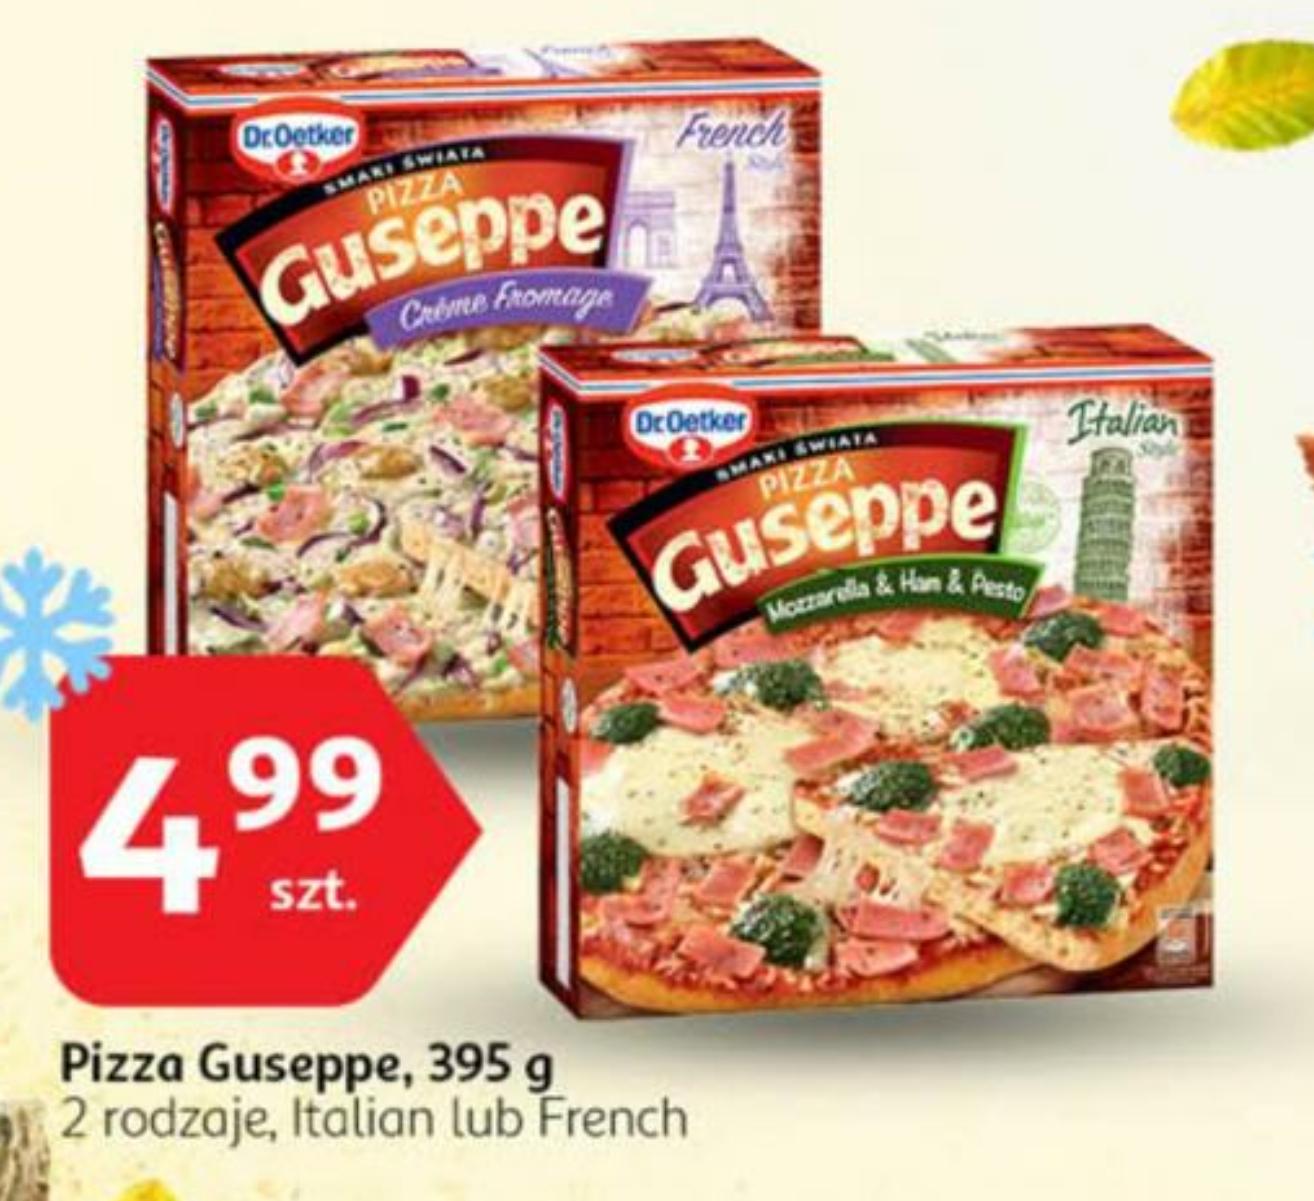 Od 02.11.2017 Pizza Guseppe @Auchan